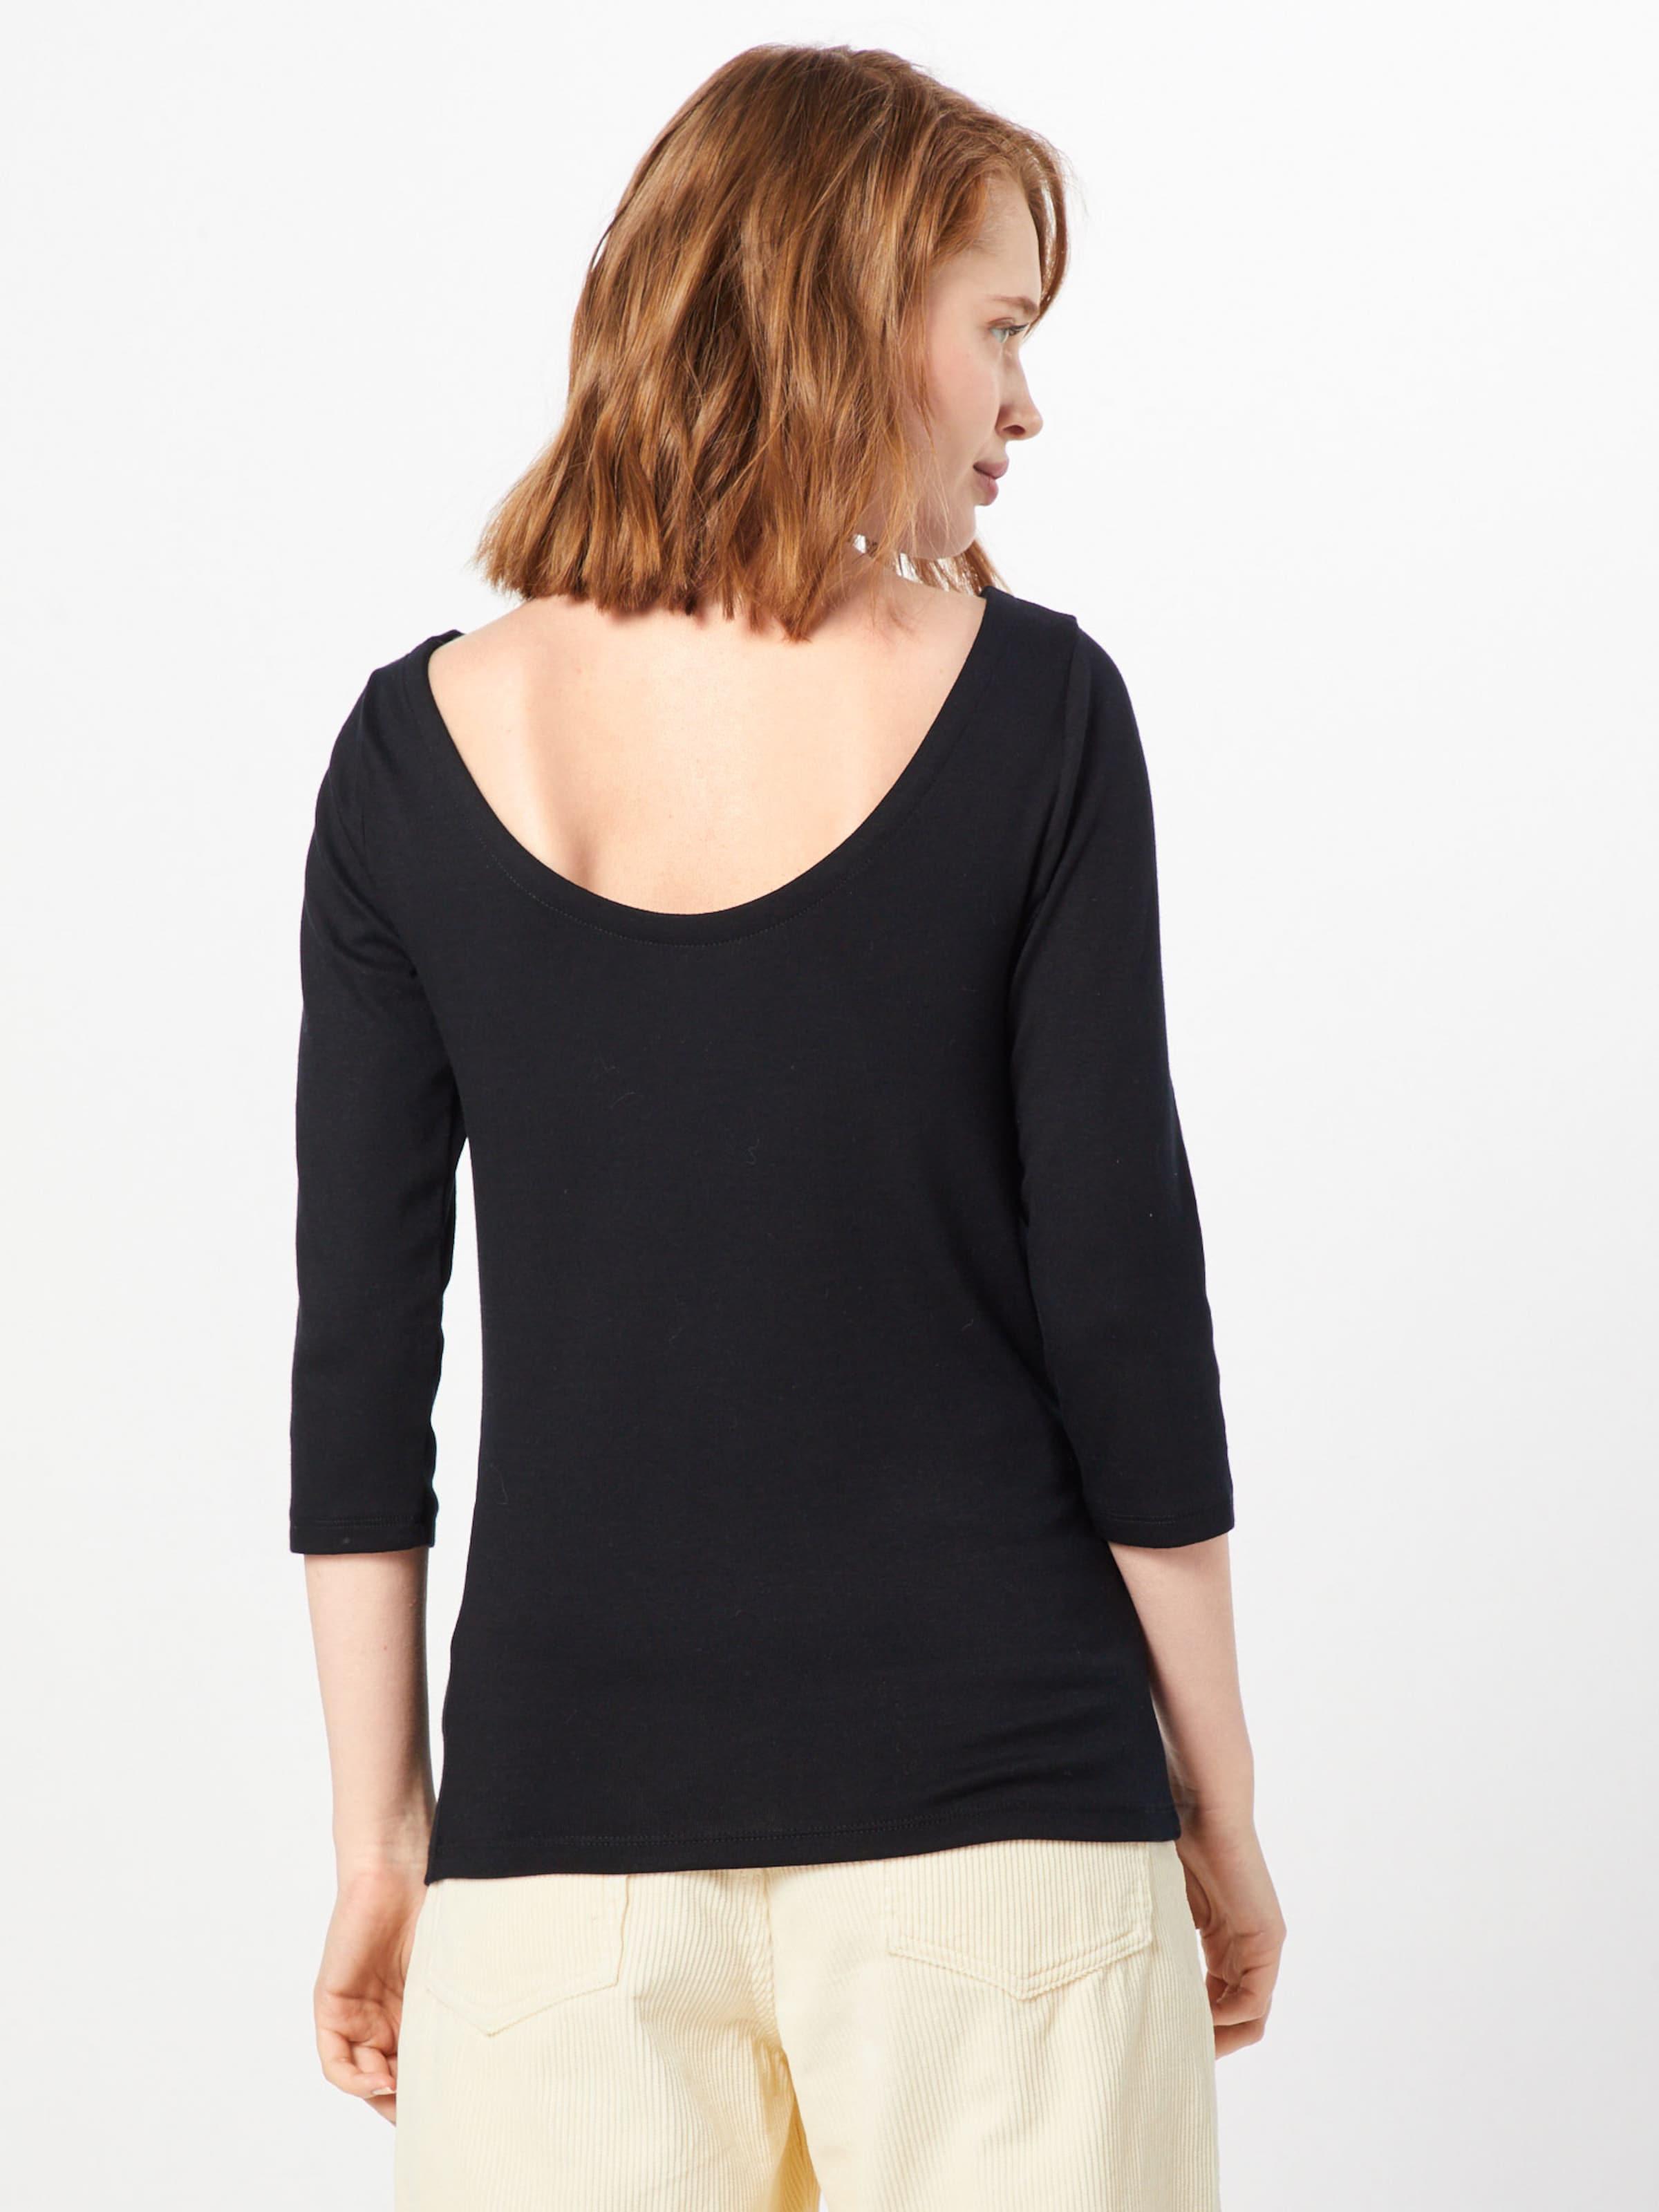 En Ballet Gap T shirt 'ss Mod Bk' Noir rhdtCxQsBo